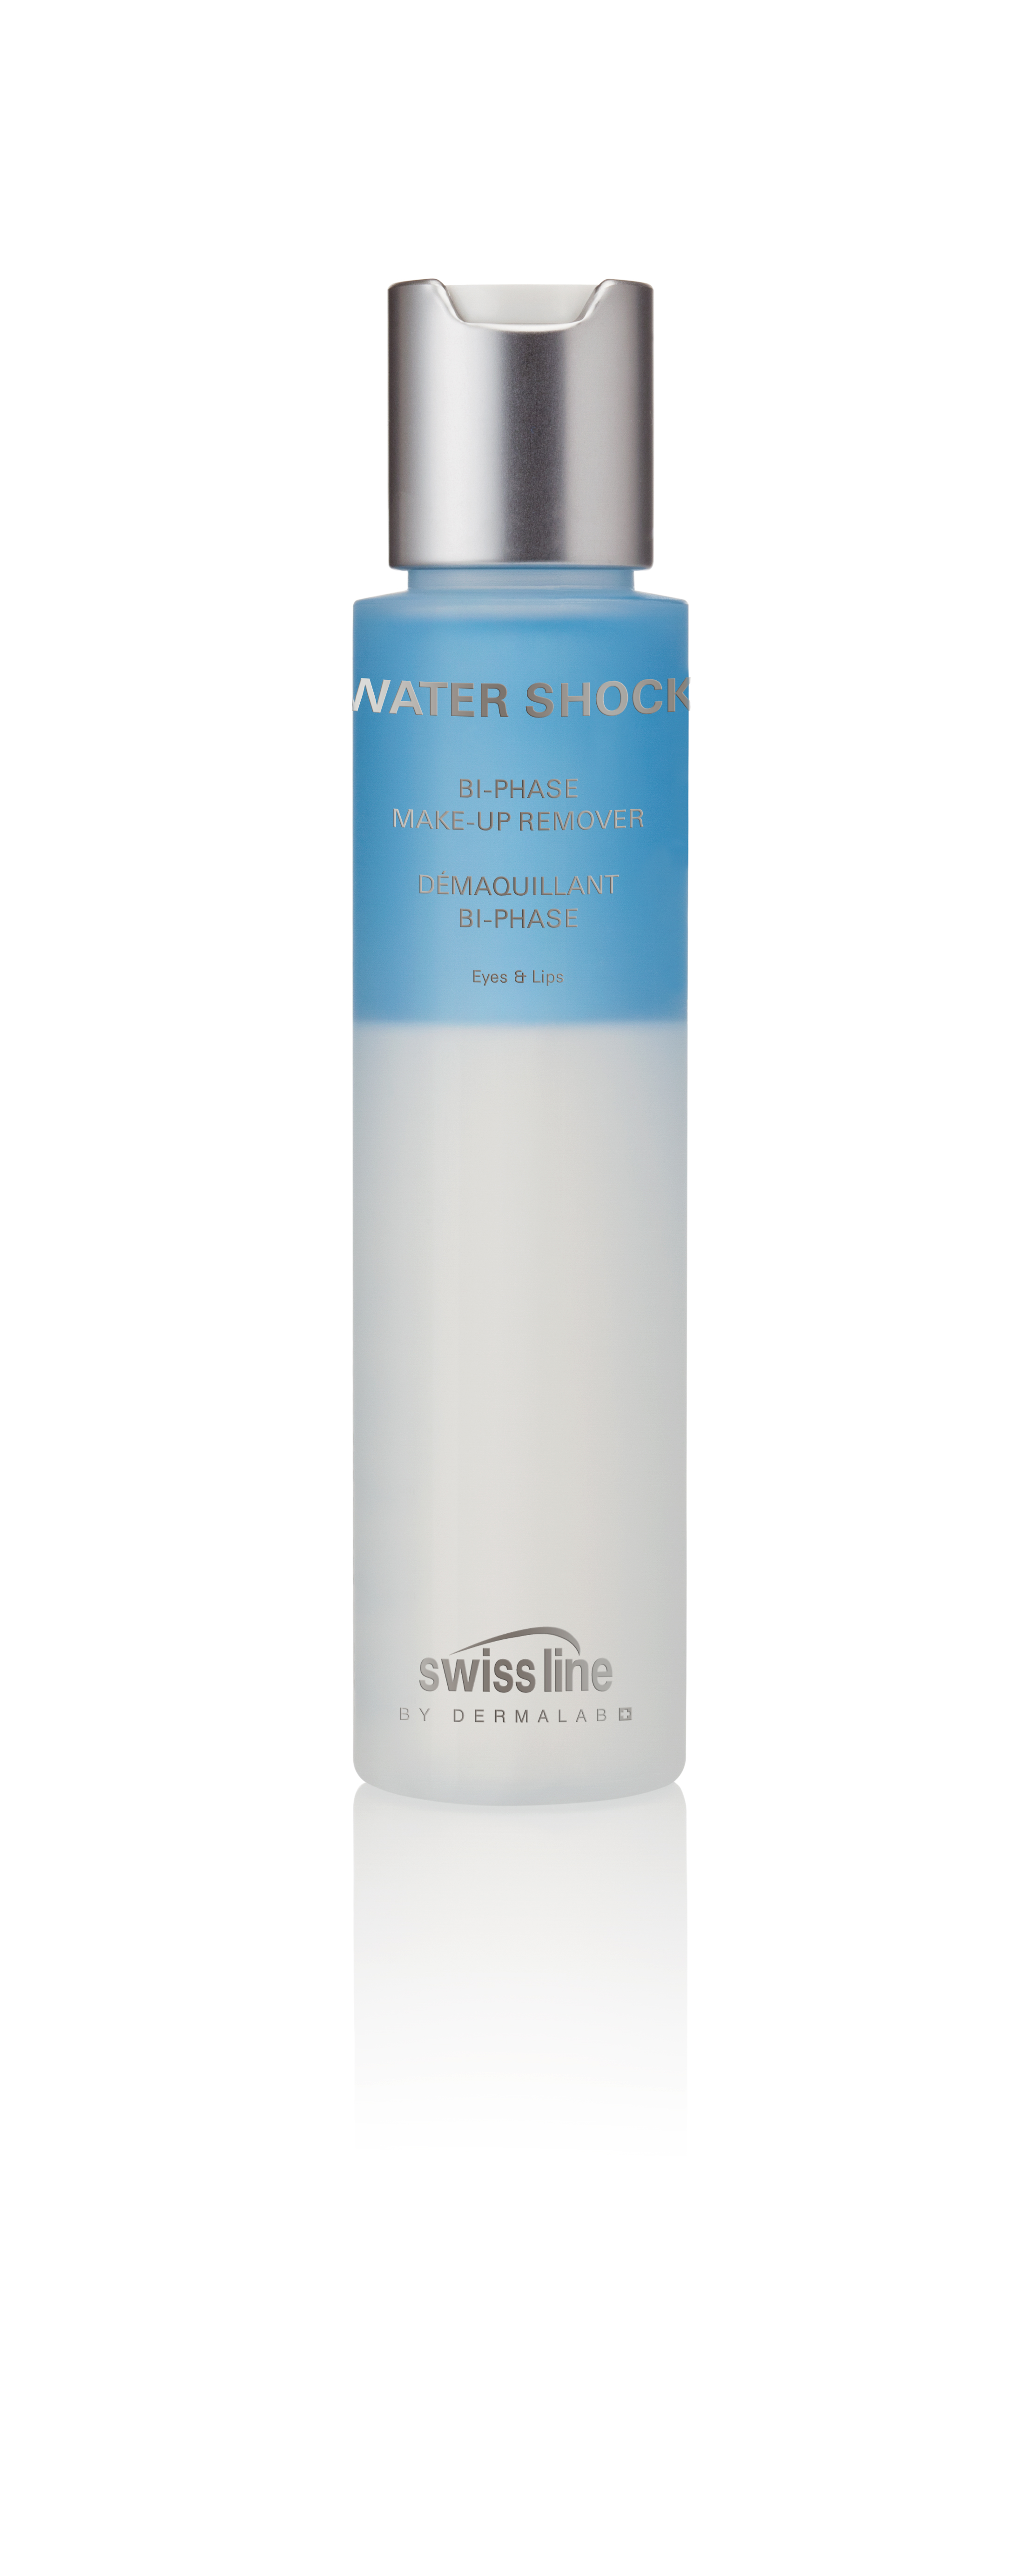 SWISS LINE Средство двухфазное для снятия макияжа с лица и глаз / Bi-phase make-up remover 100 мл